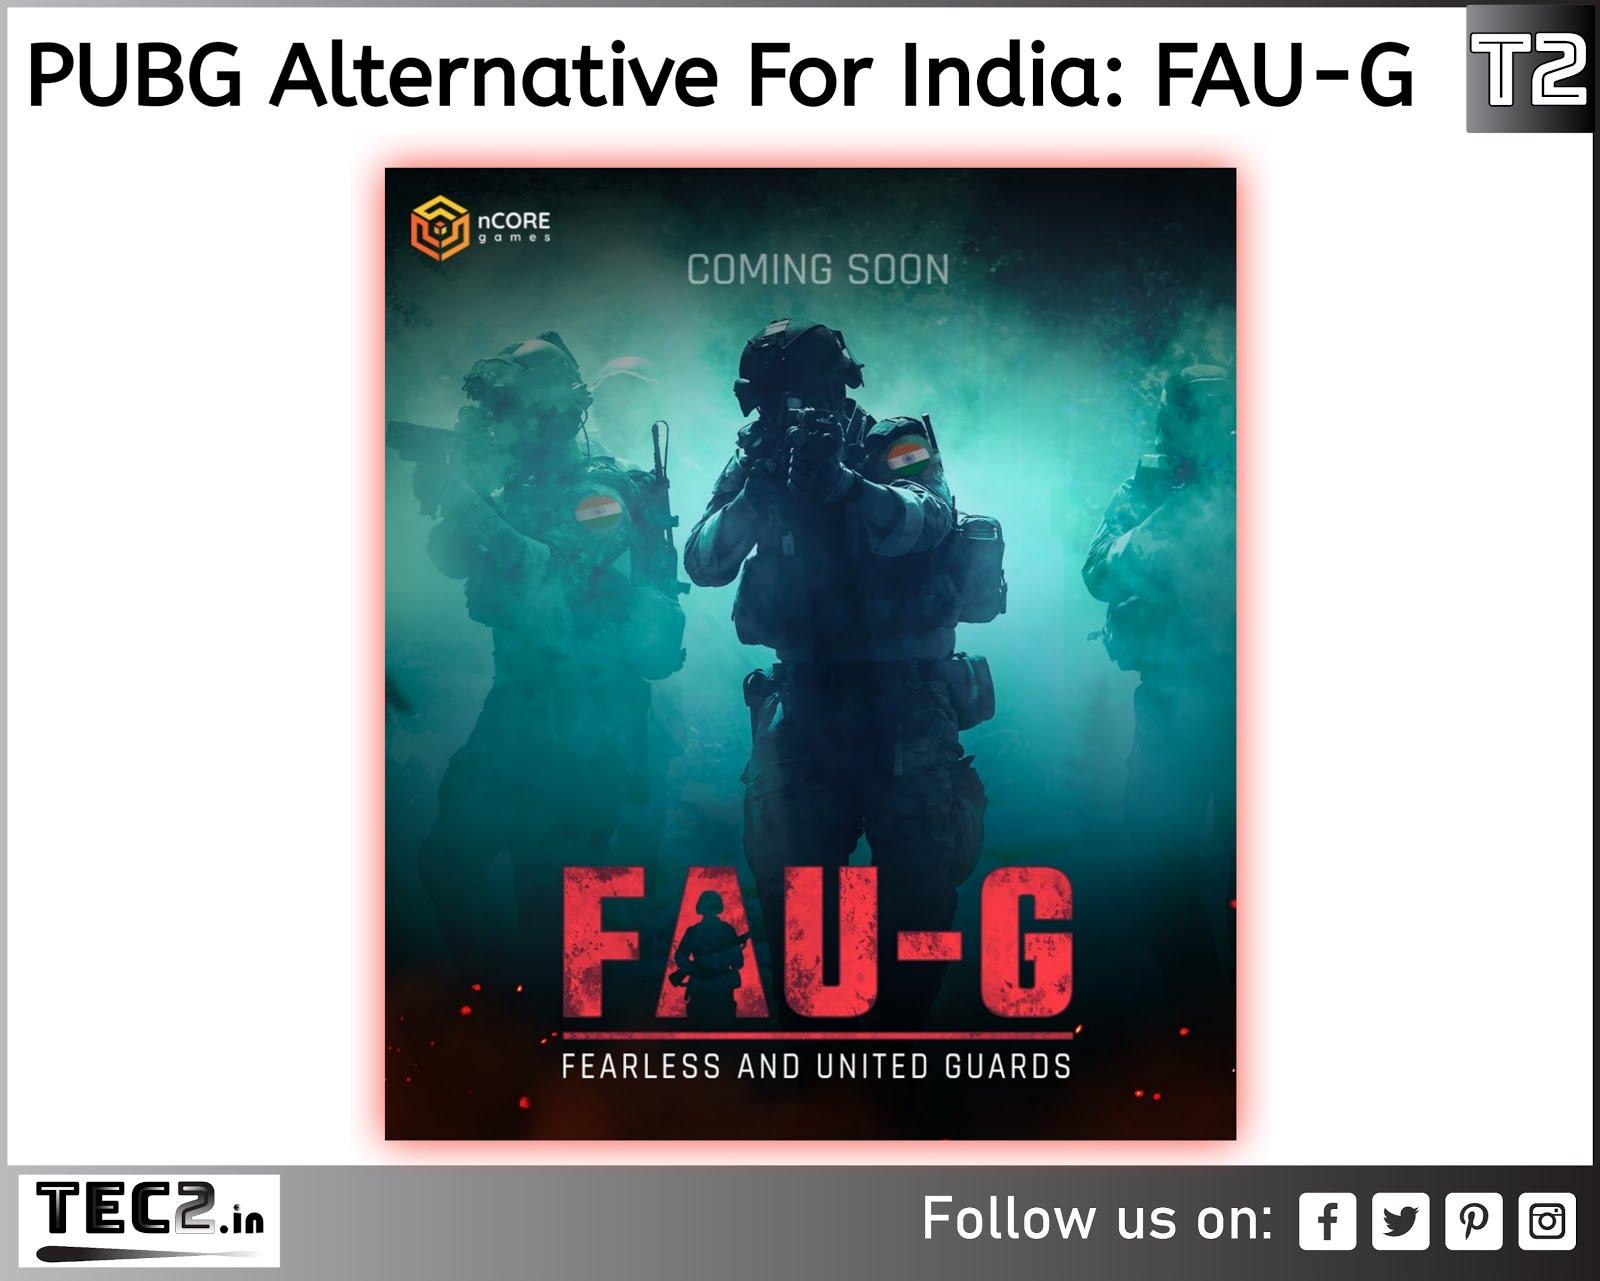 FAU-G Indian PUBG